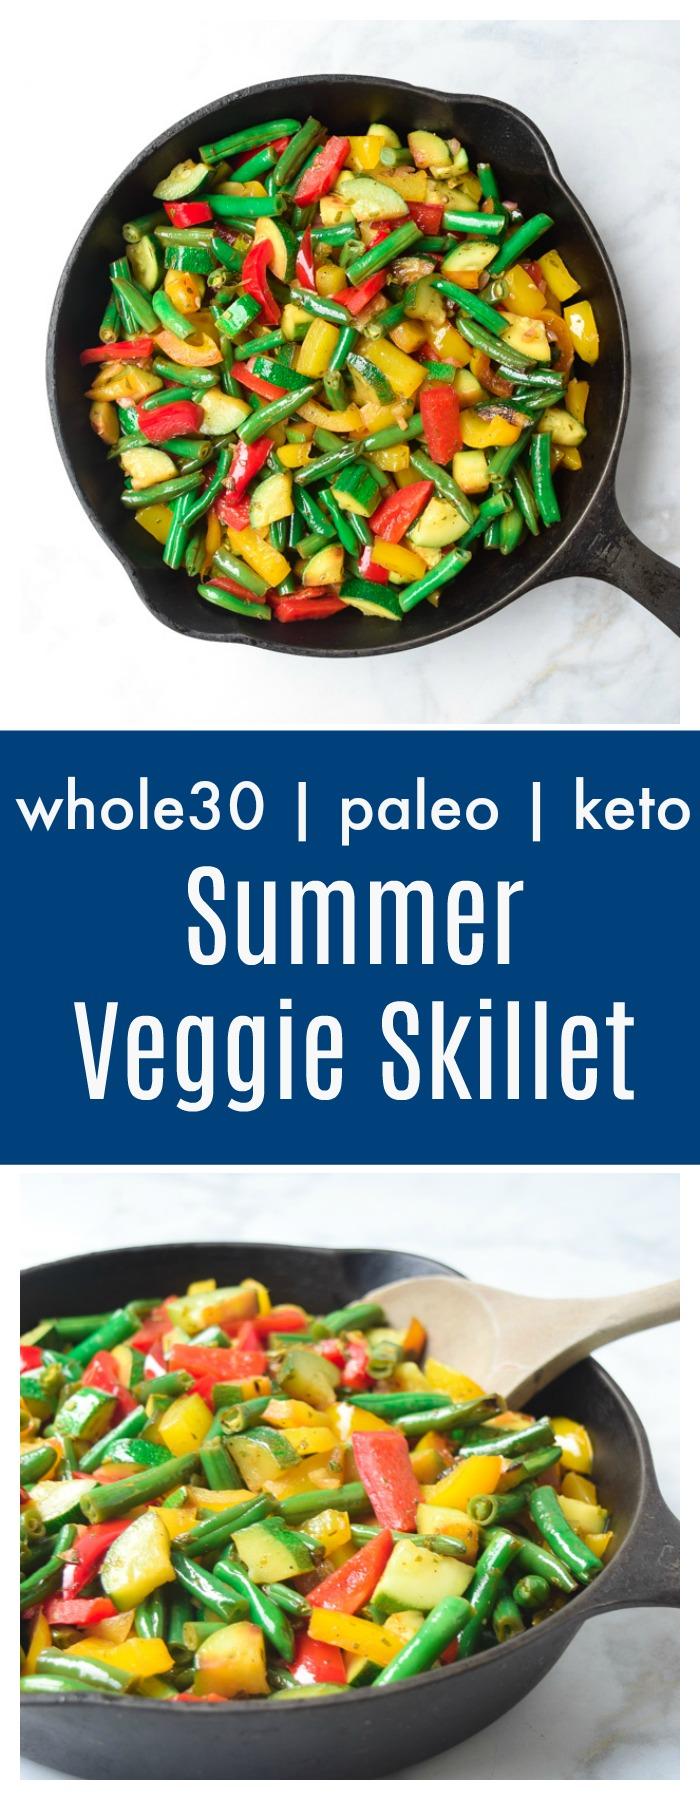 summer veggie skillet